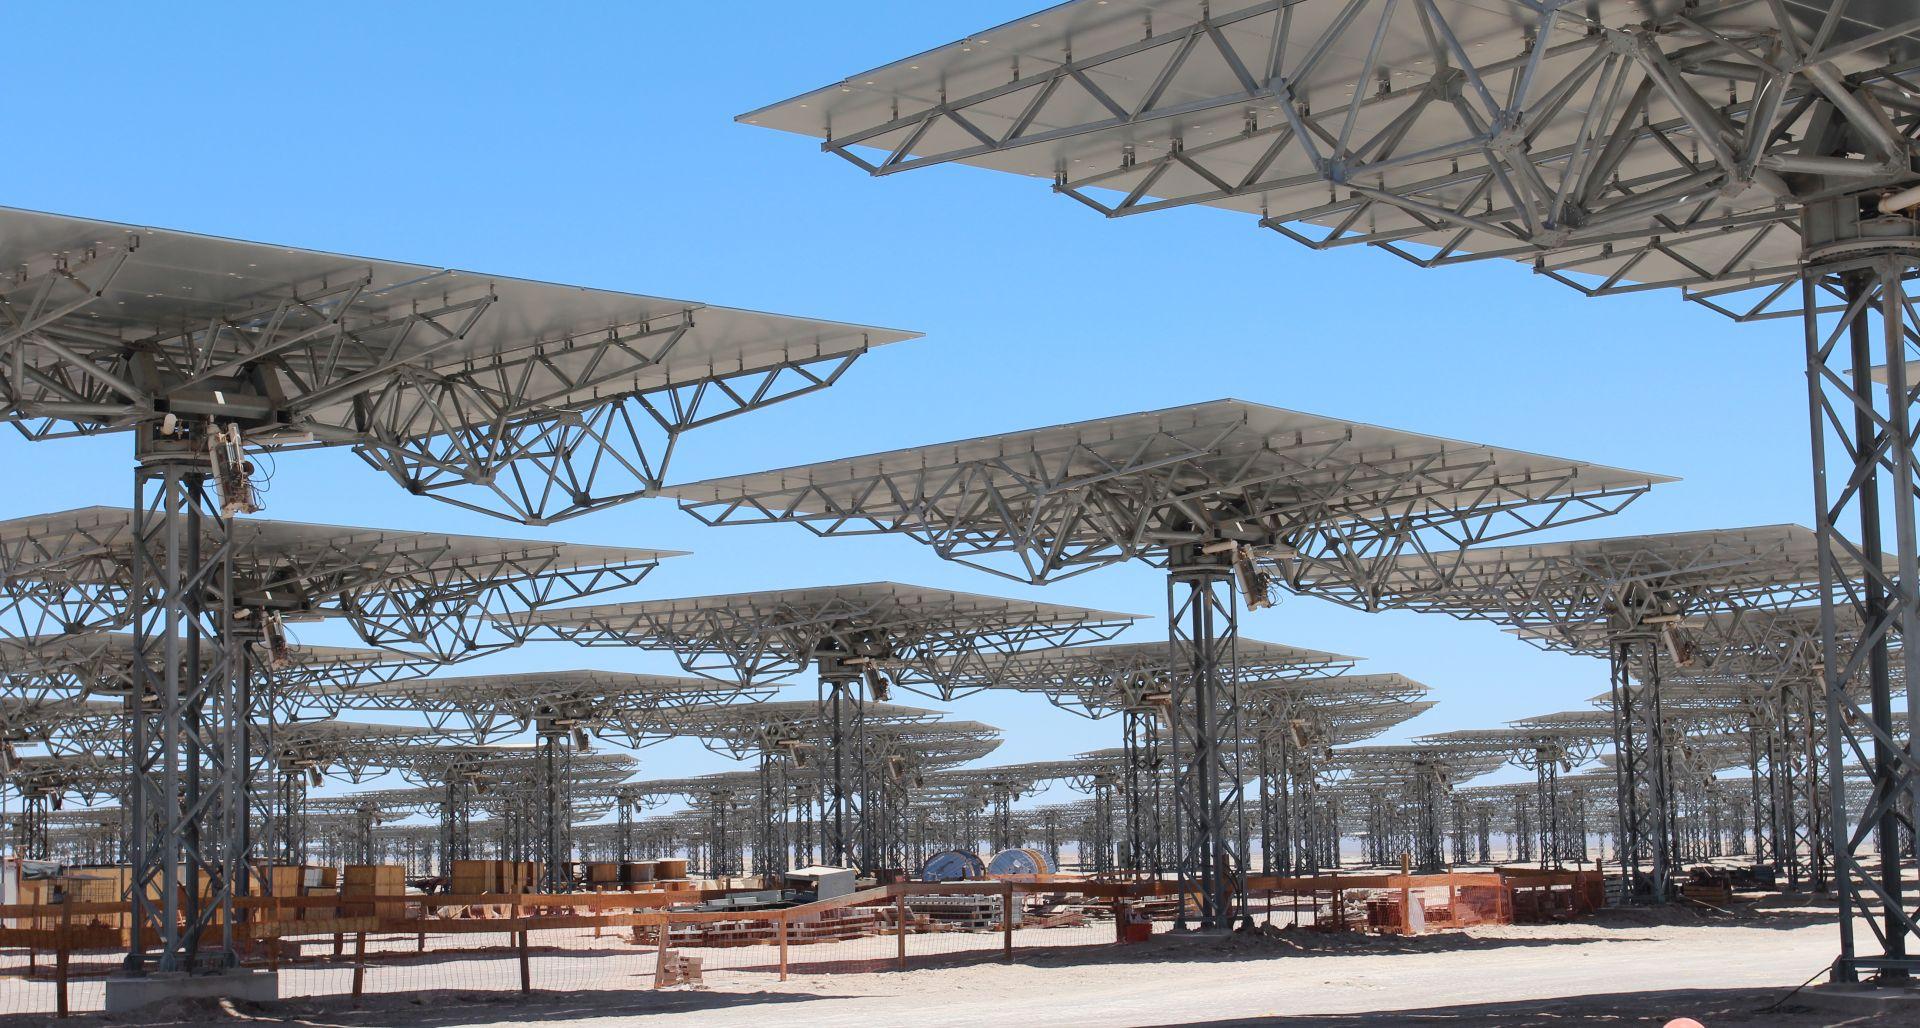 solar panel plant under construction